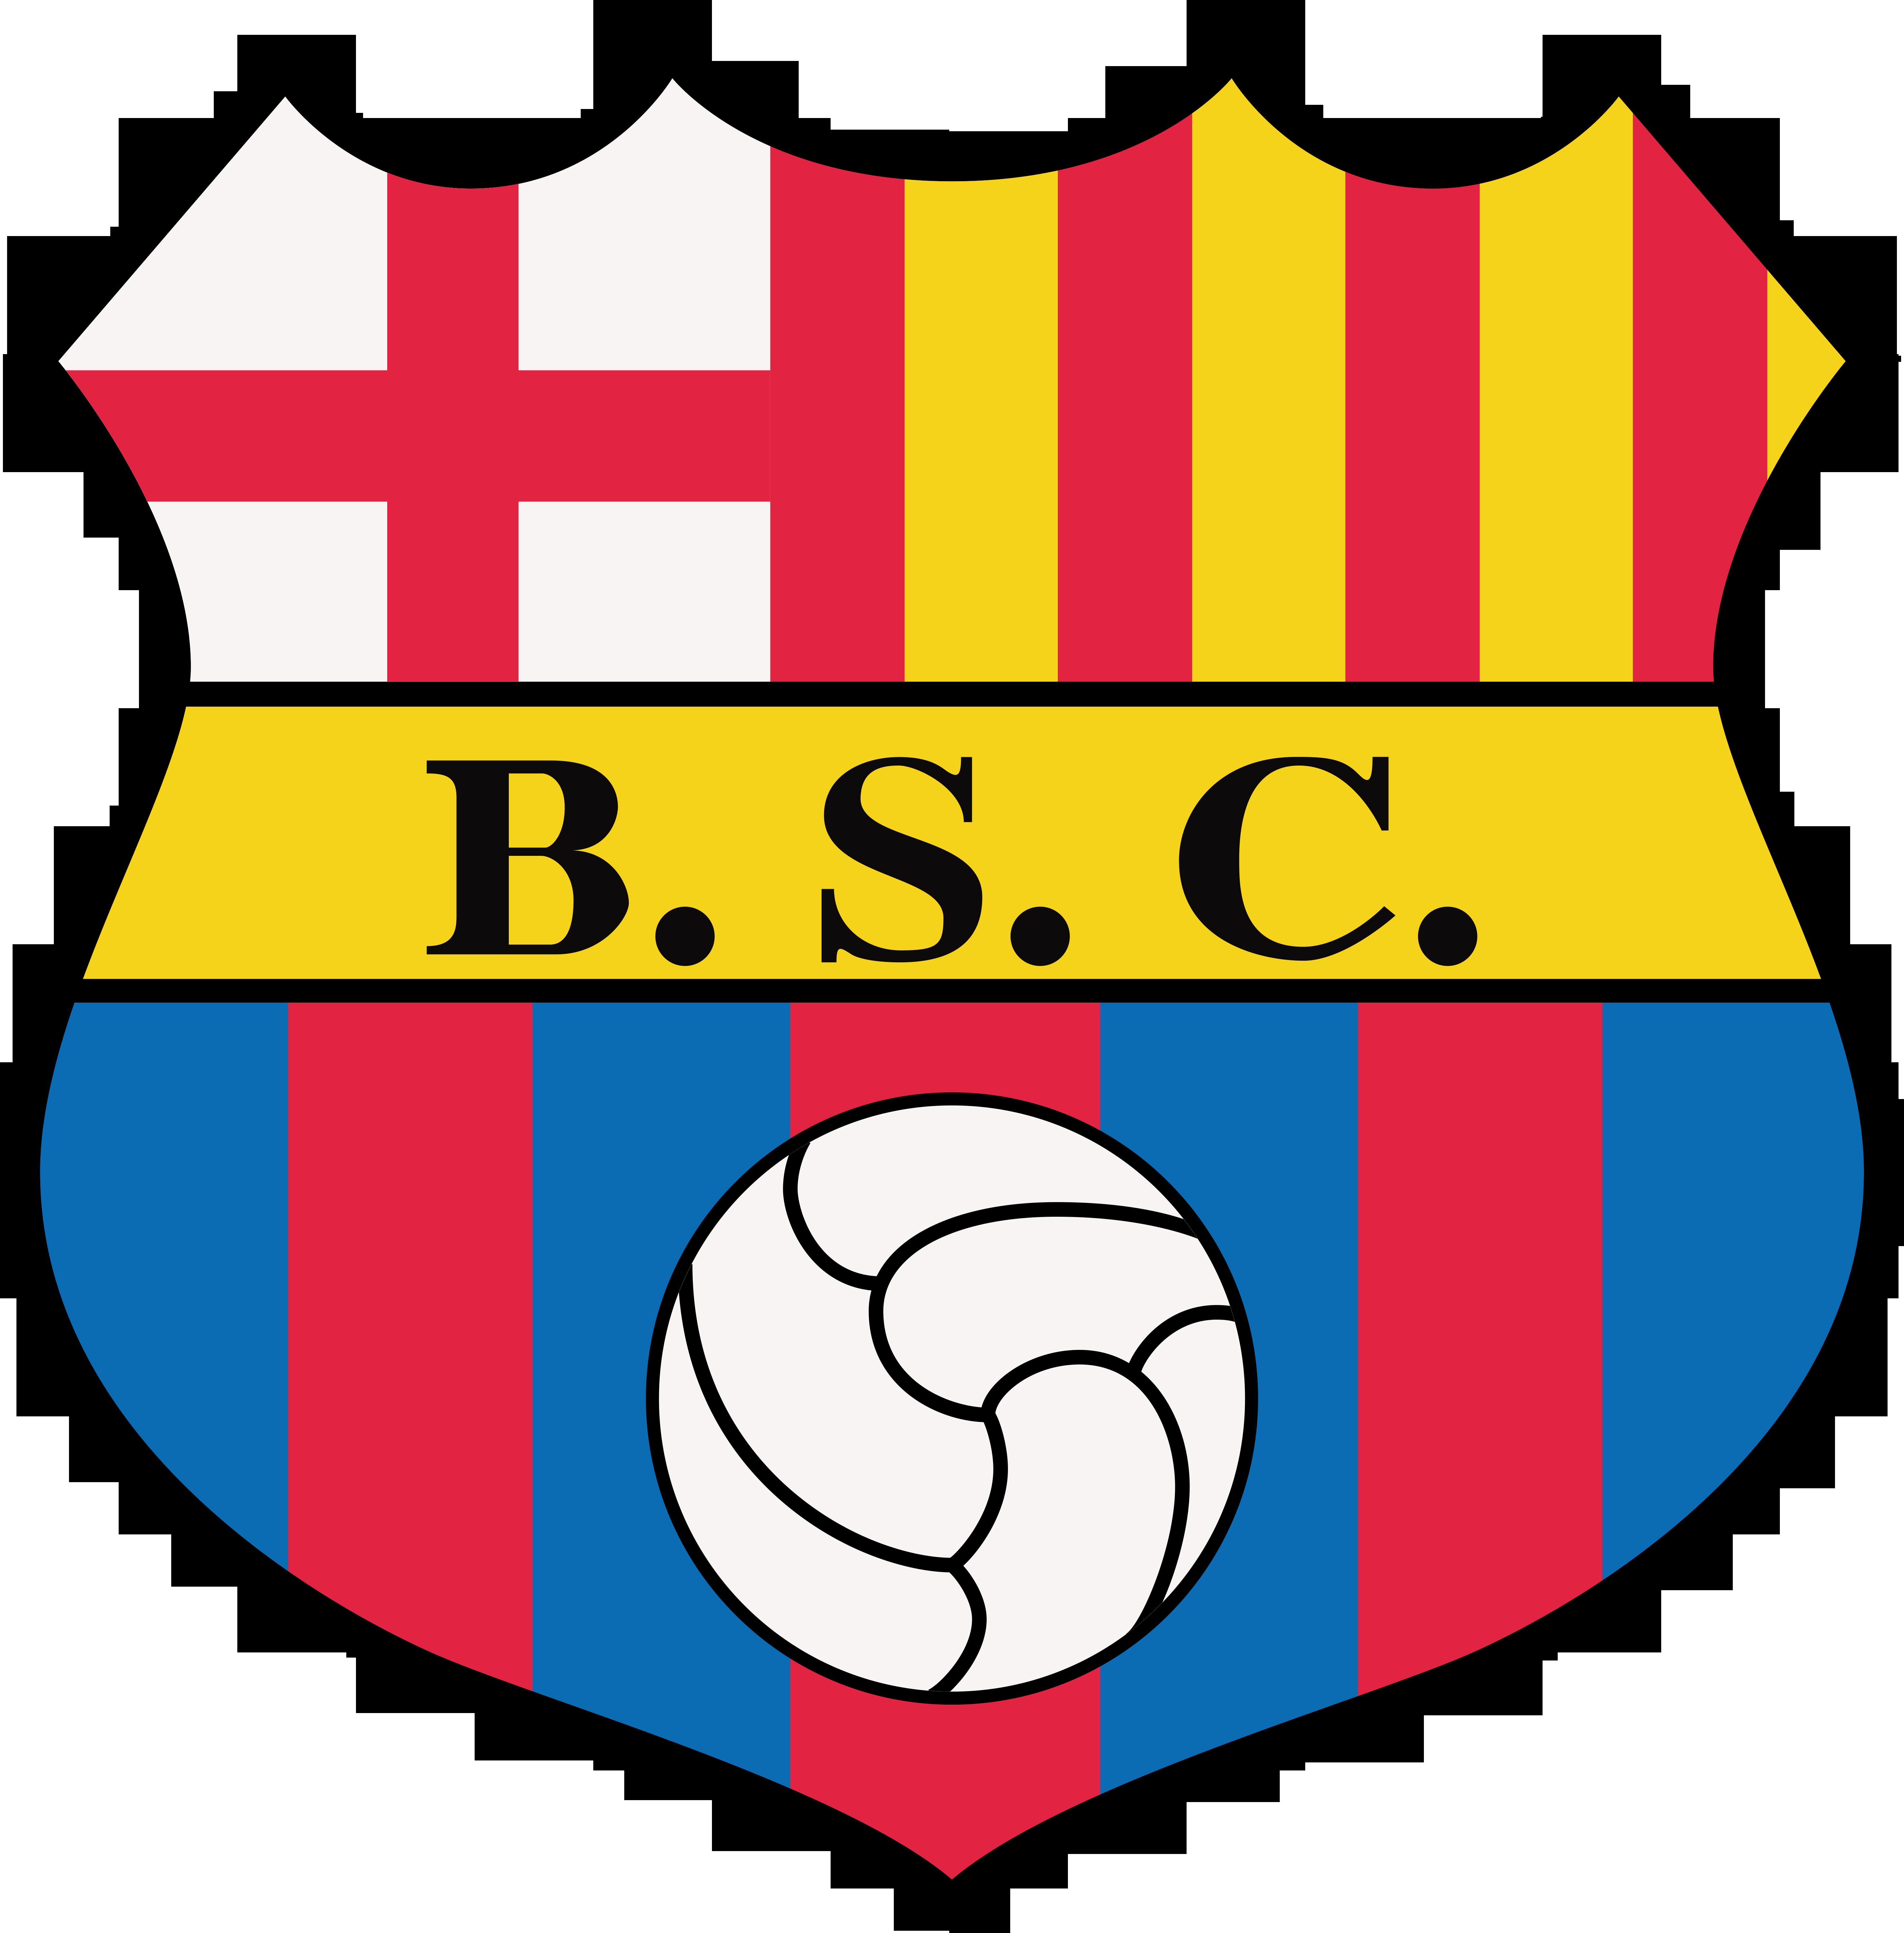 ملف:Barcelona.